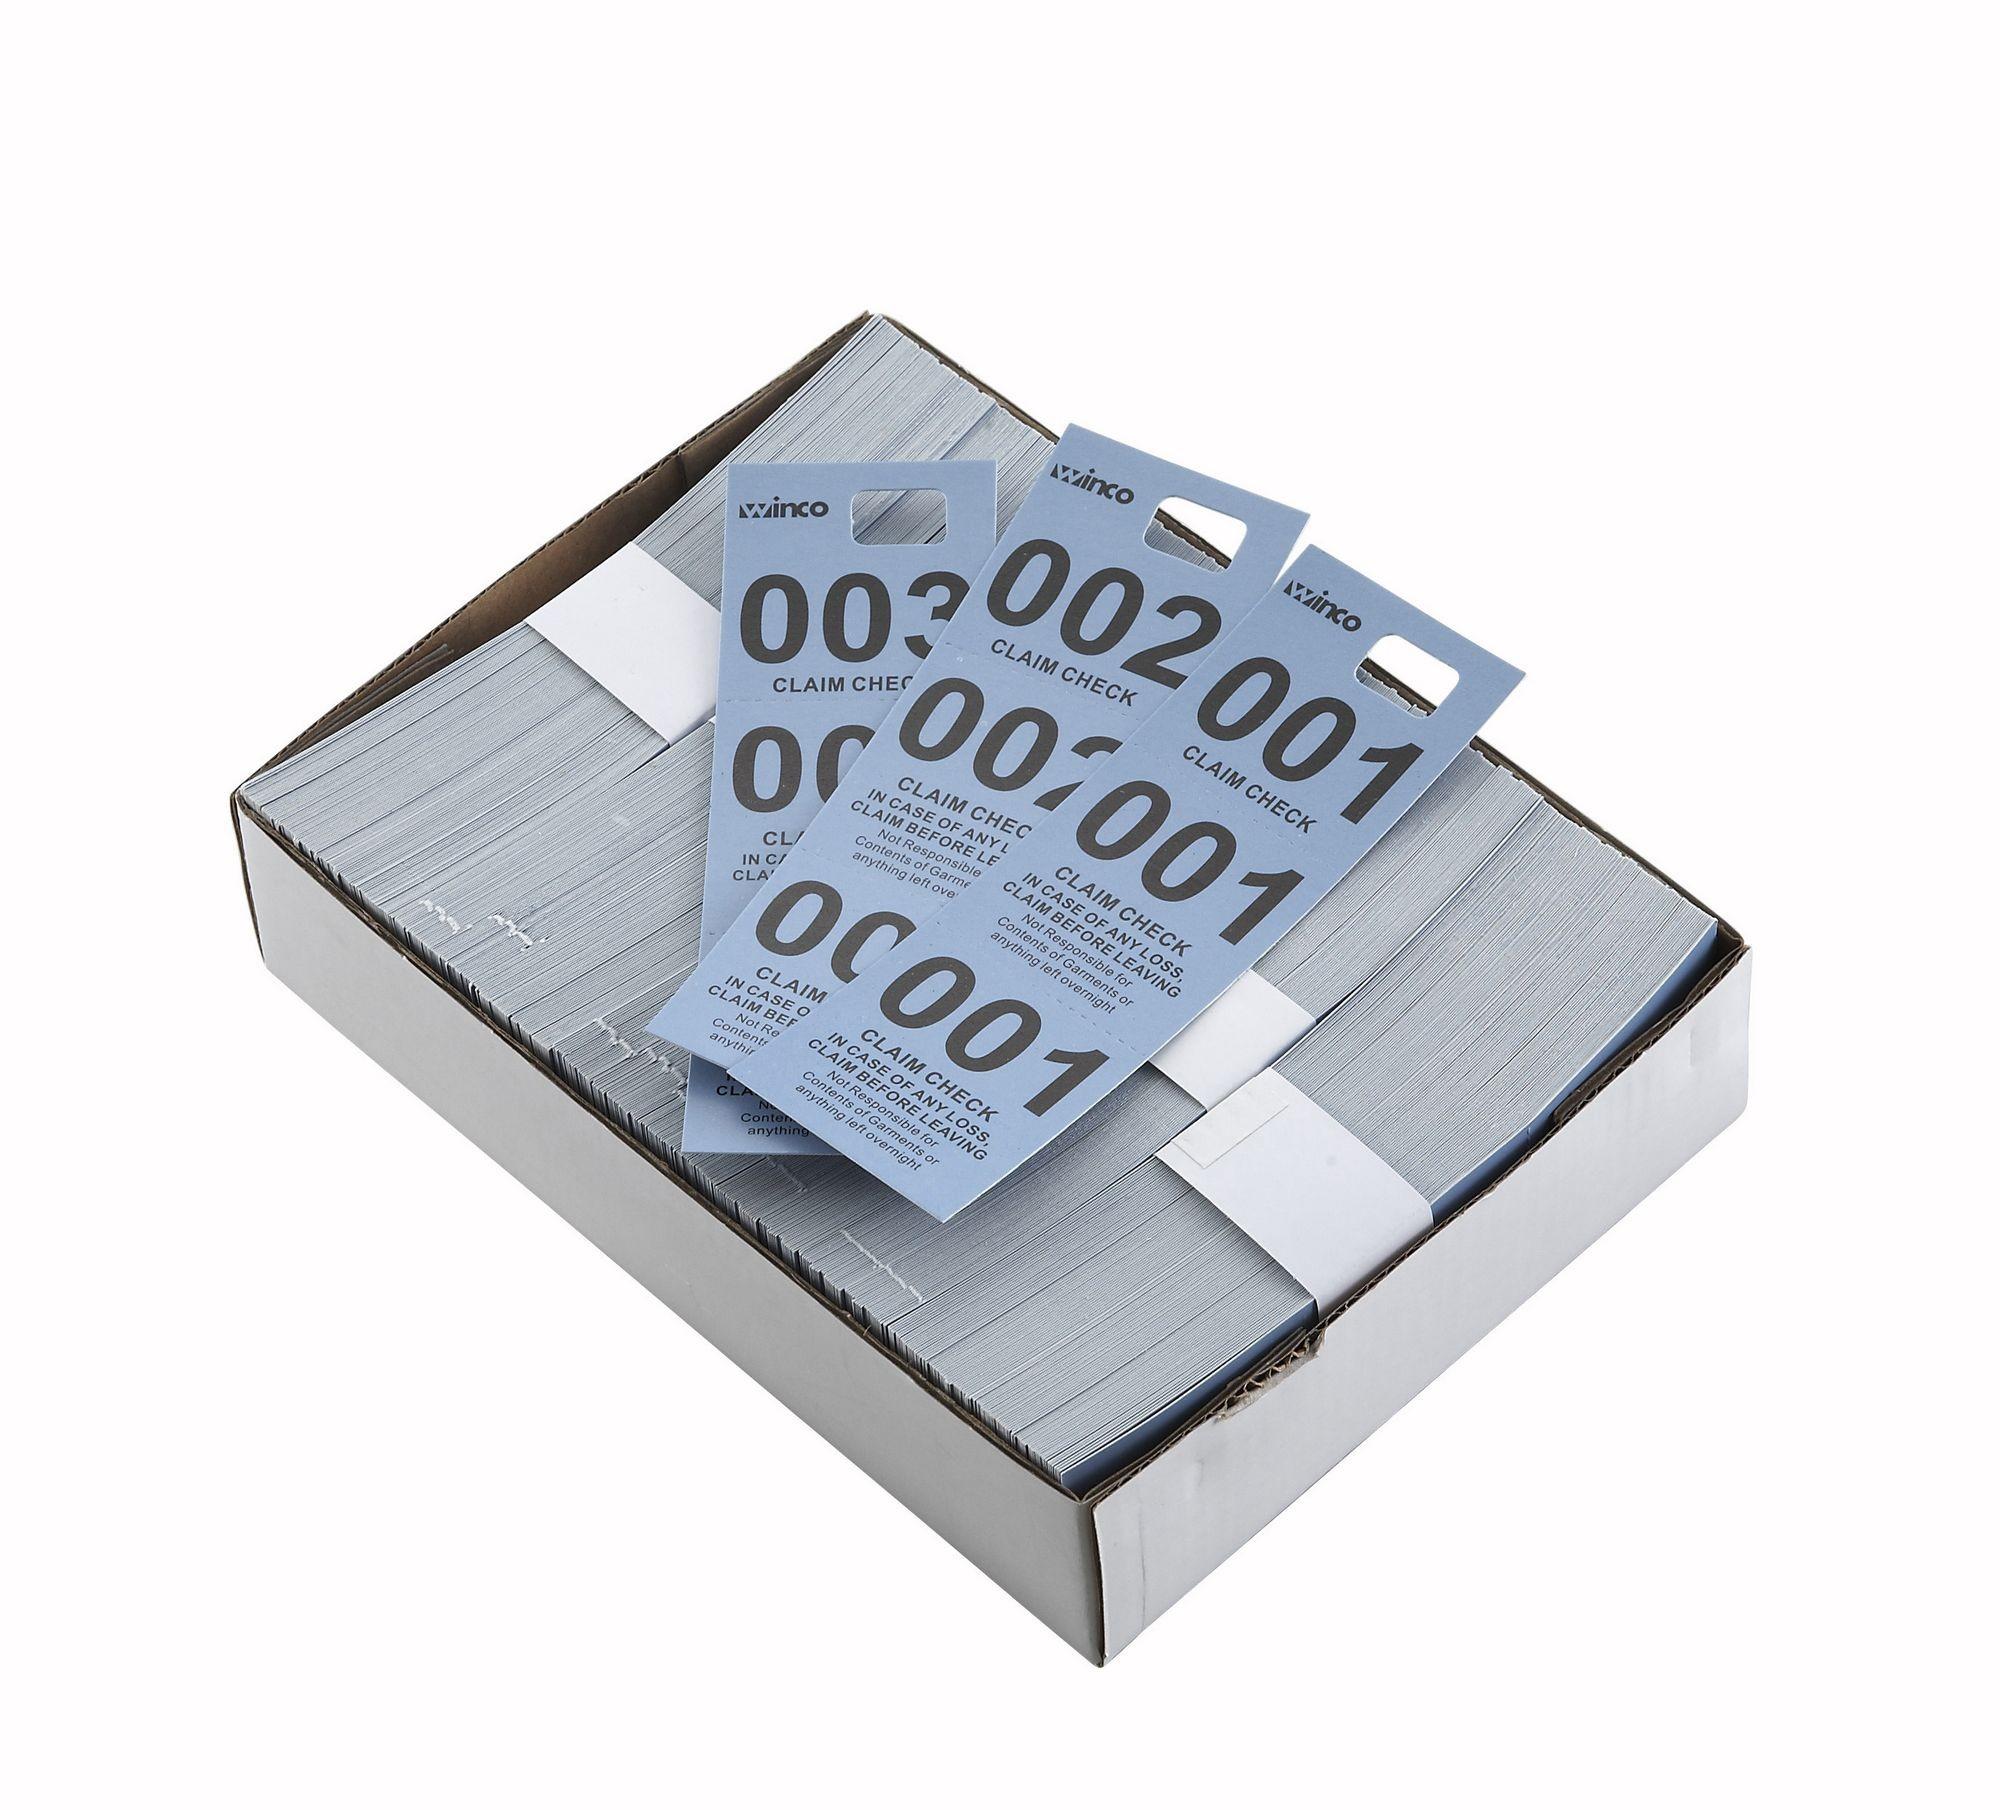 Winco CCK-5BL Blue Coat Check Tags (500 Pieces per Box) - LionsDeal